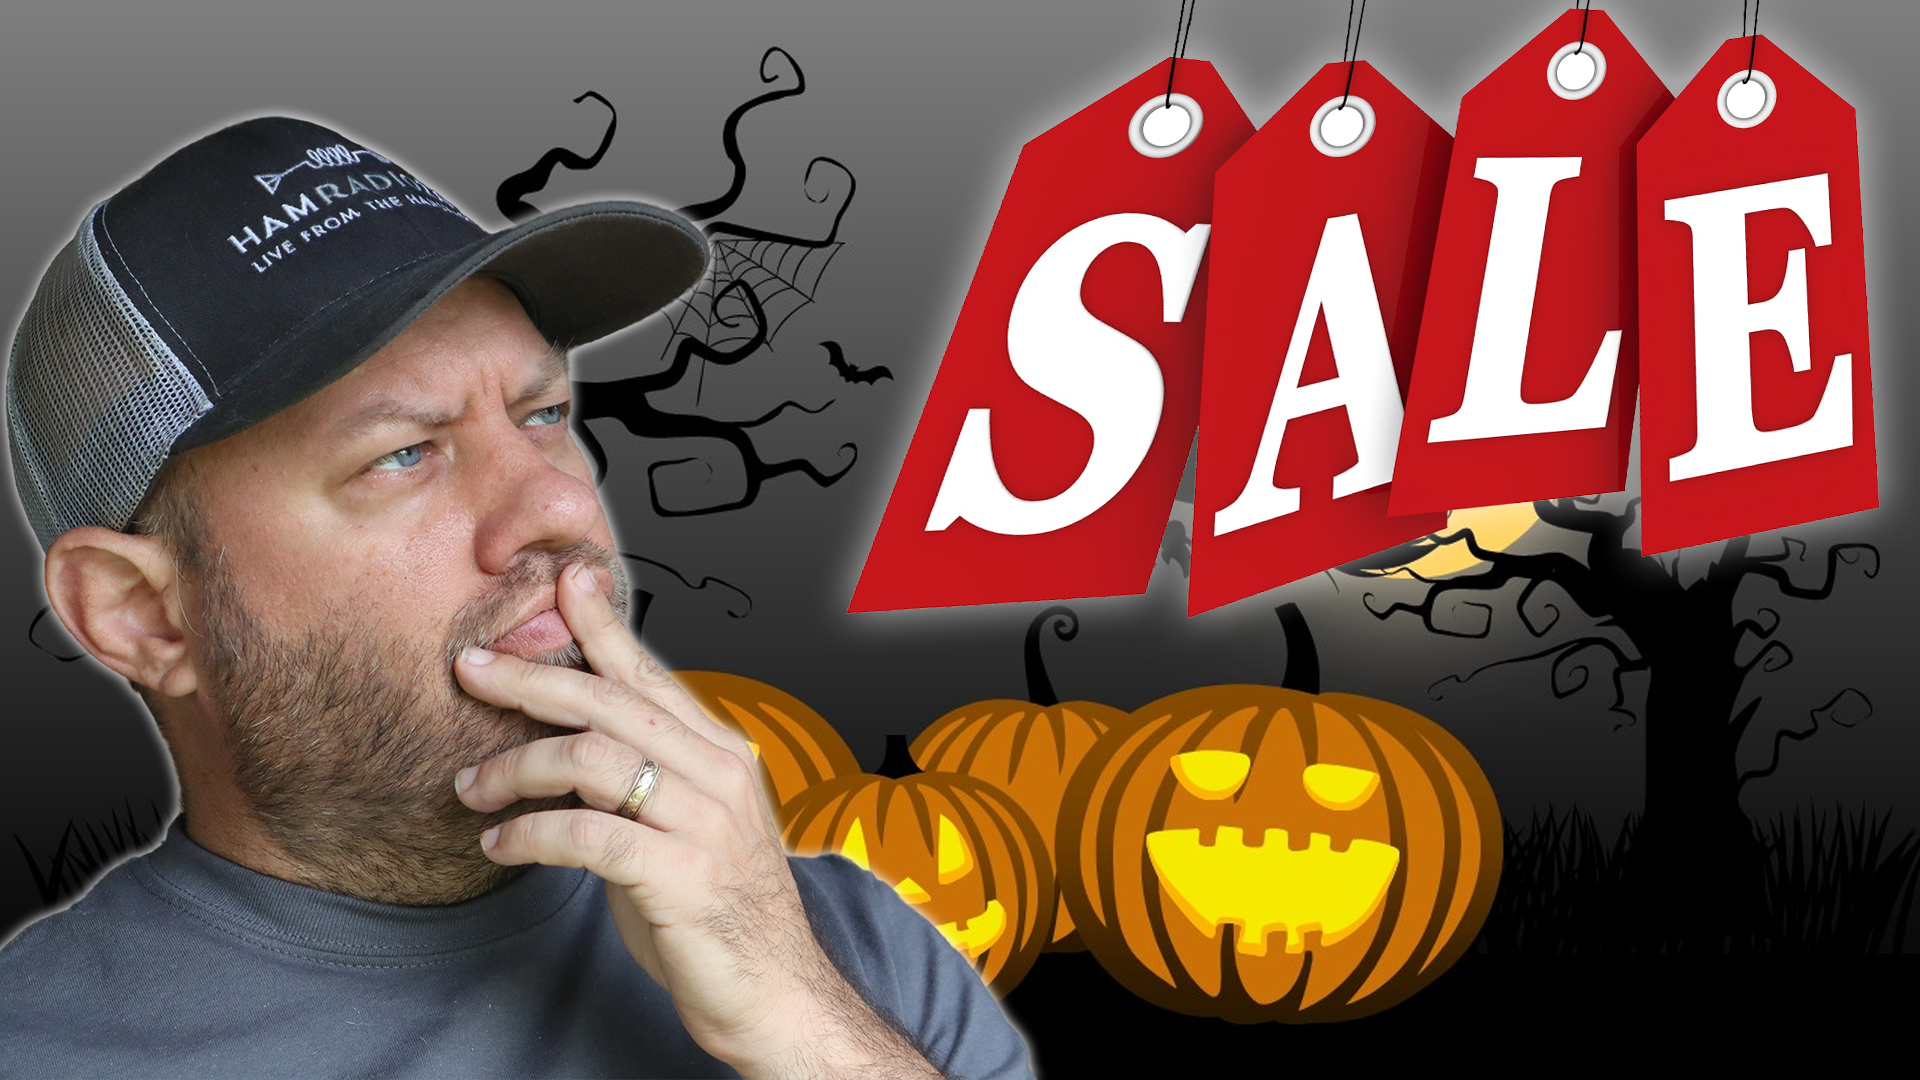 Episode 485: Ham Radio Shopping Deals for Halloween! 2020